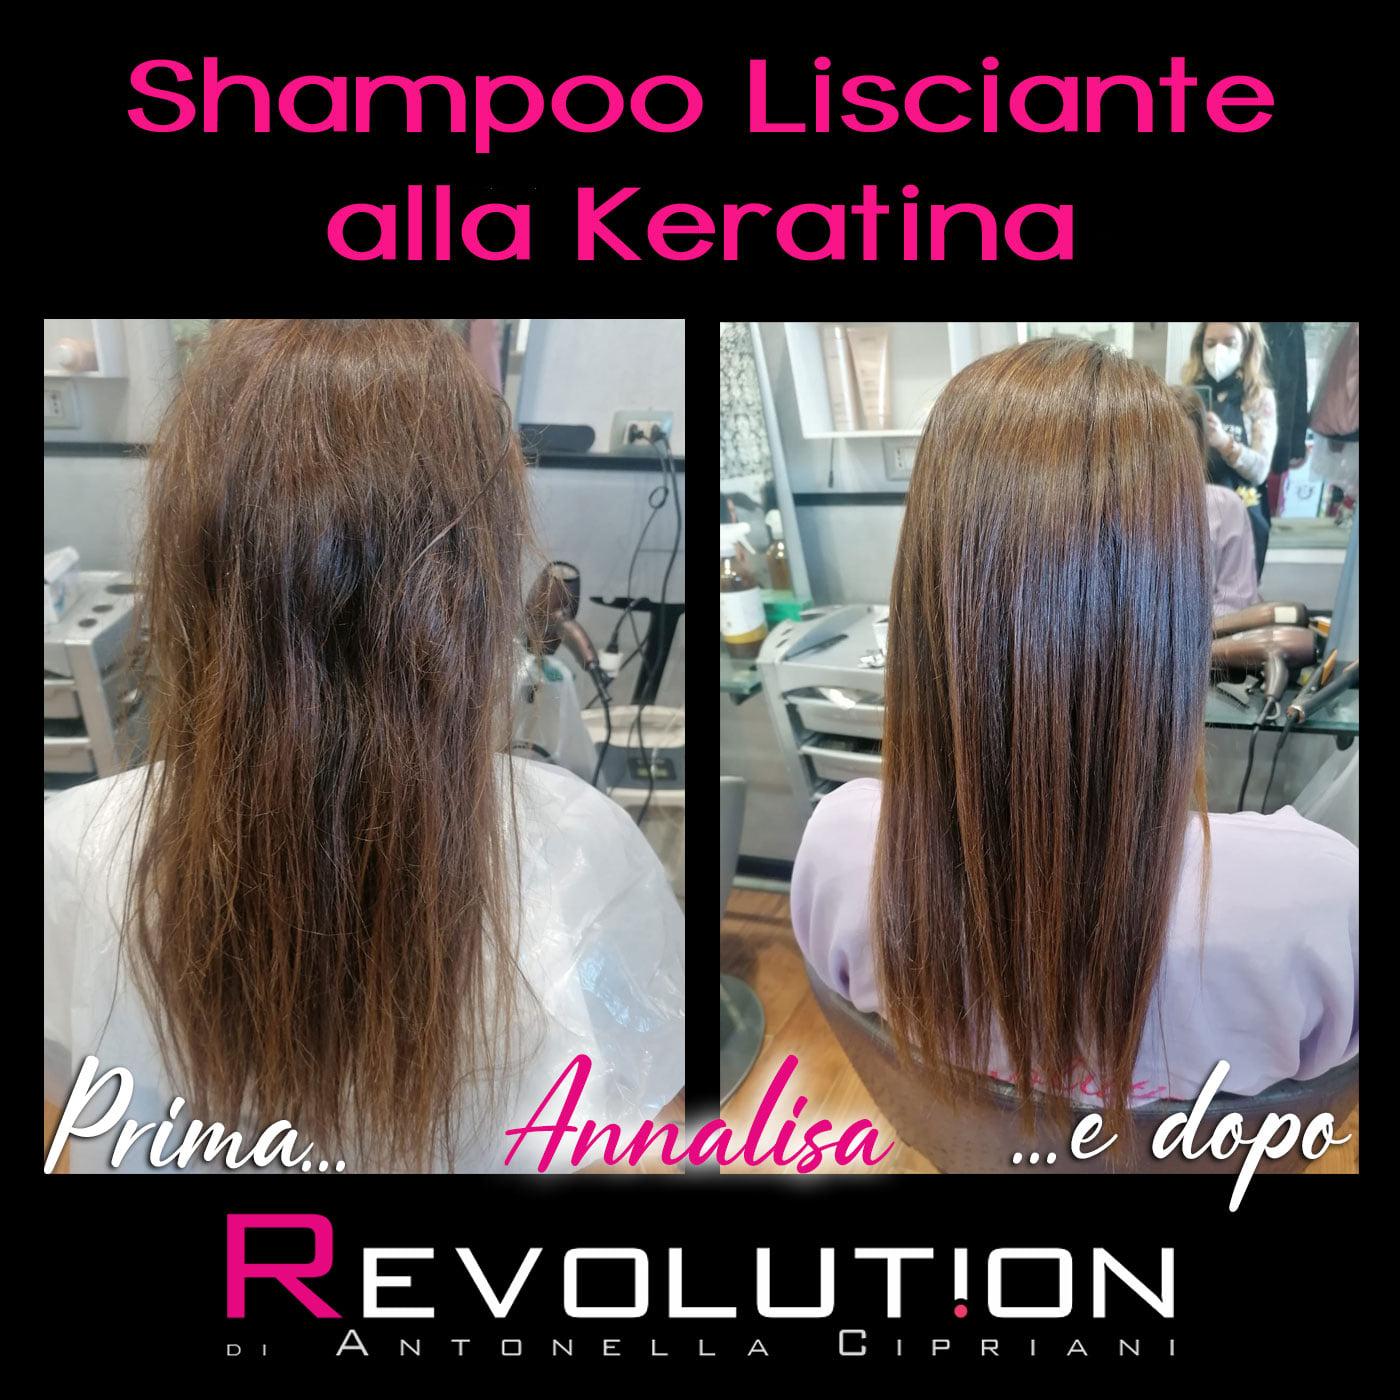 Shampoo lisciante alla Keratina